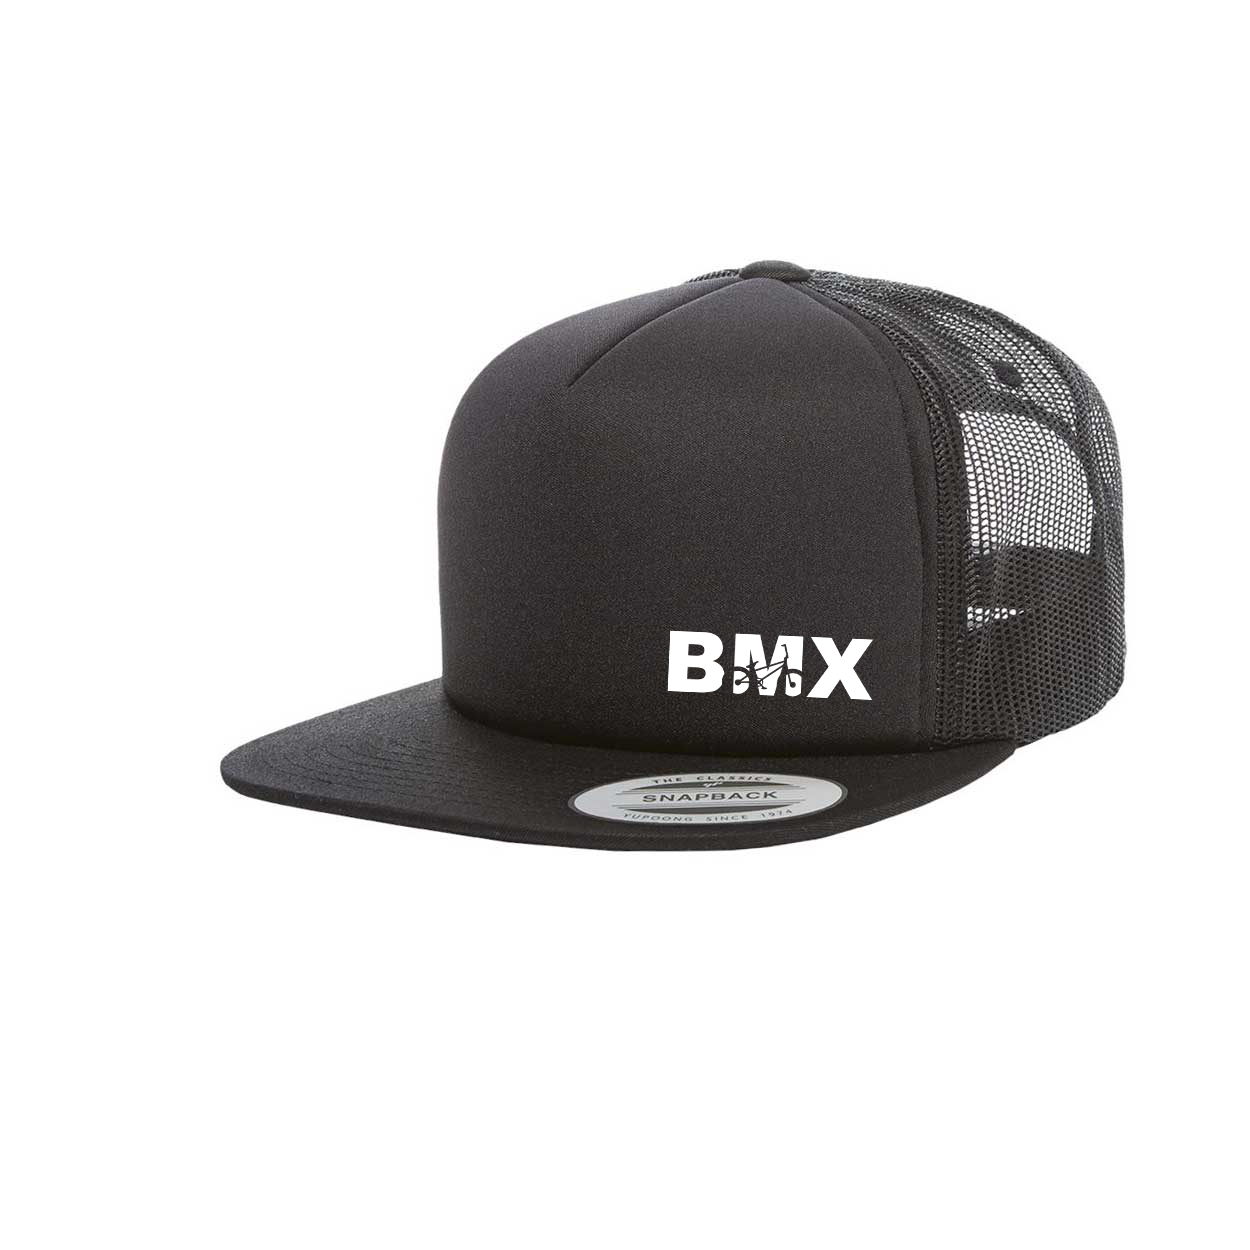 BMX Bike Logo Night Out Premium Foam Flat Brim Snapback Hat Black (White Logo)